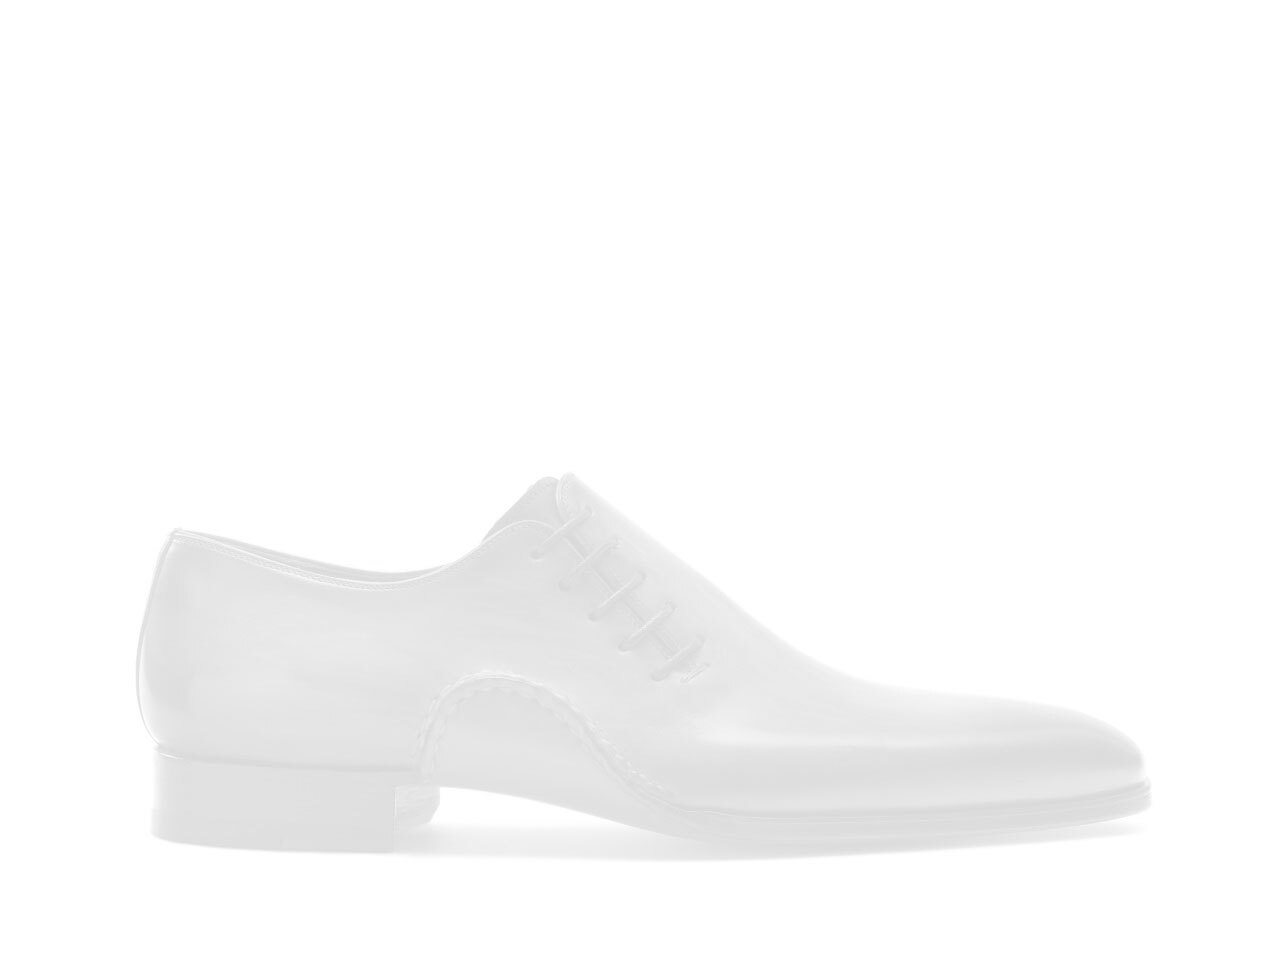 Navy blue single monk strap shoes for men - Magnanni